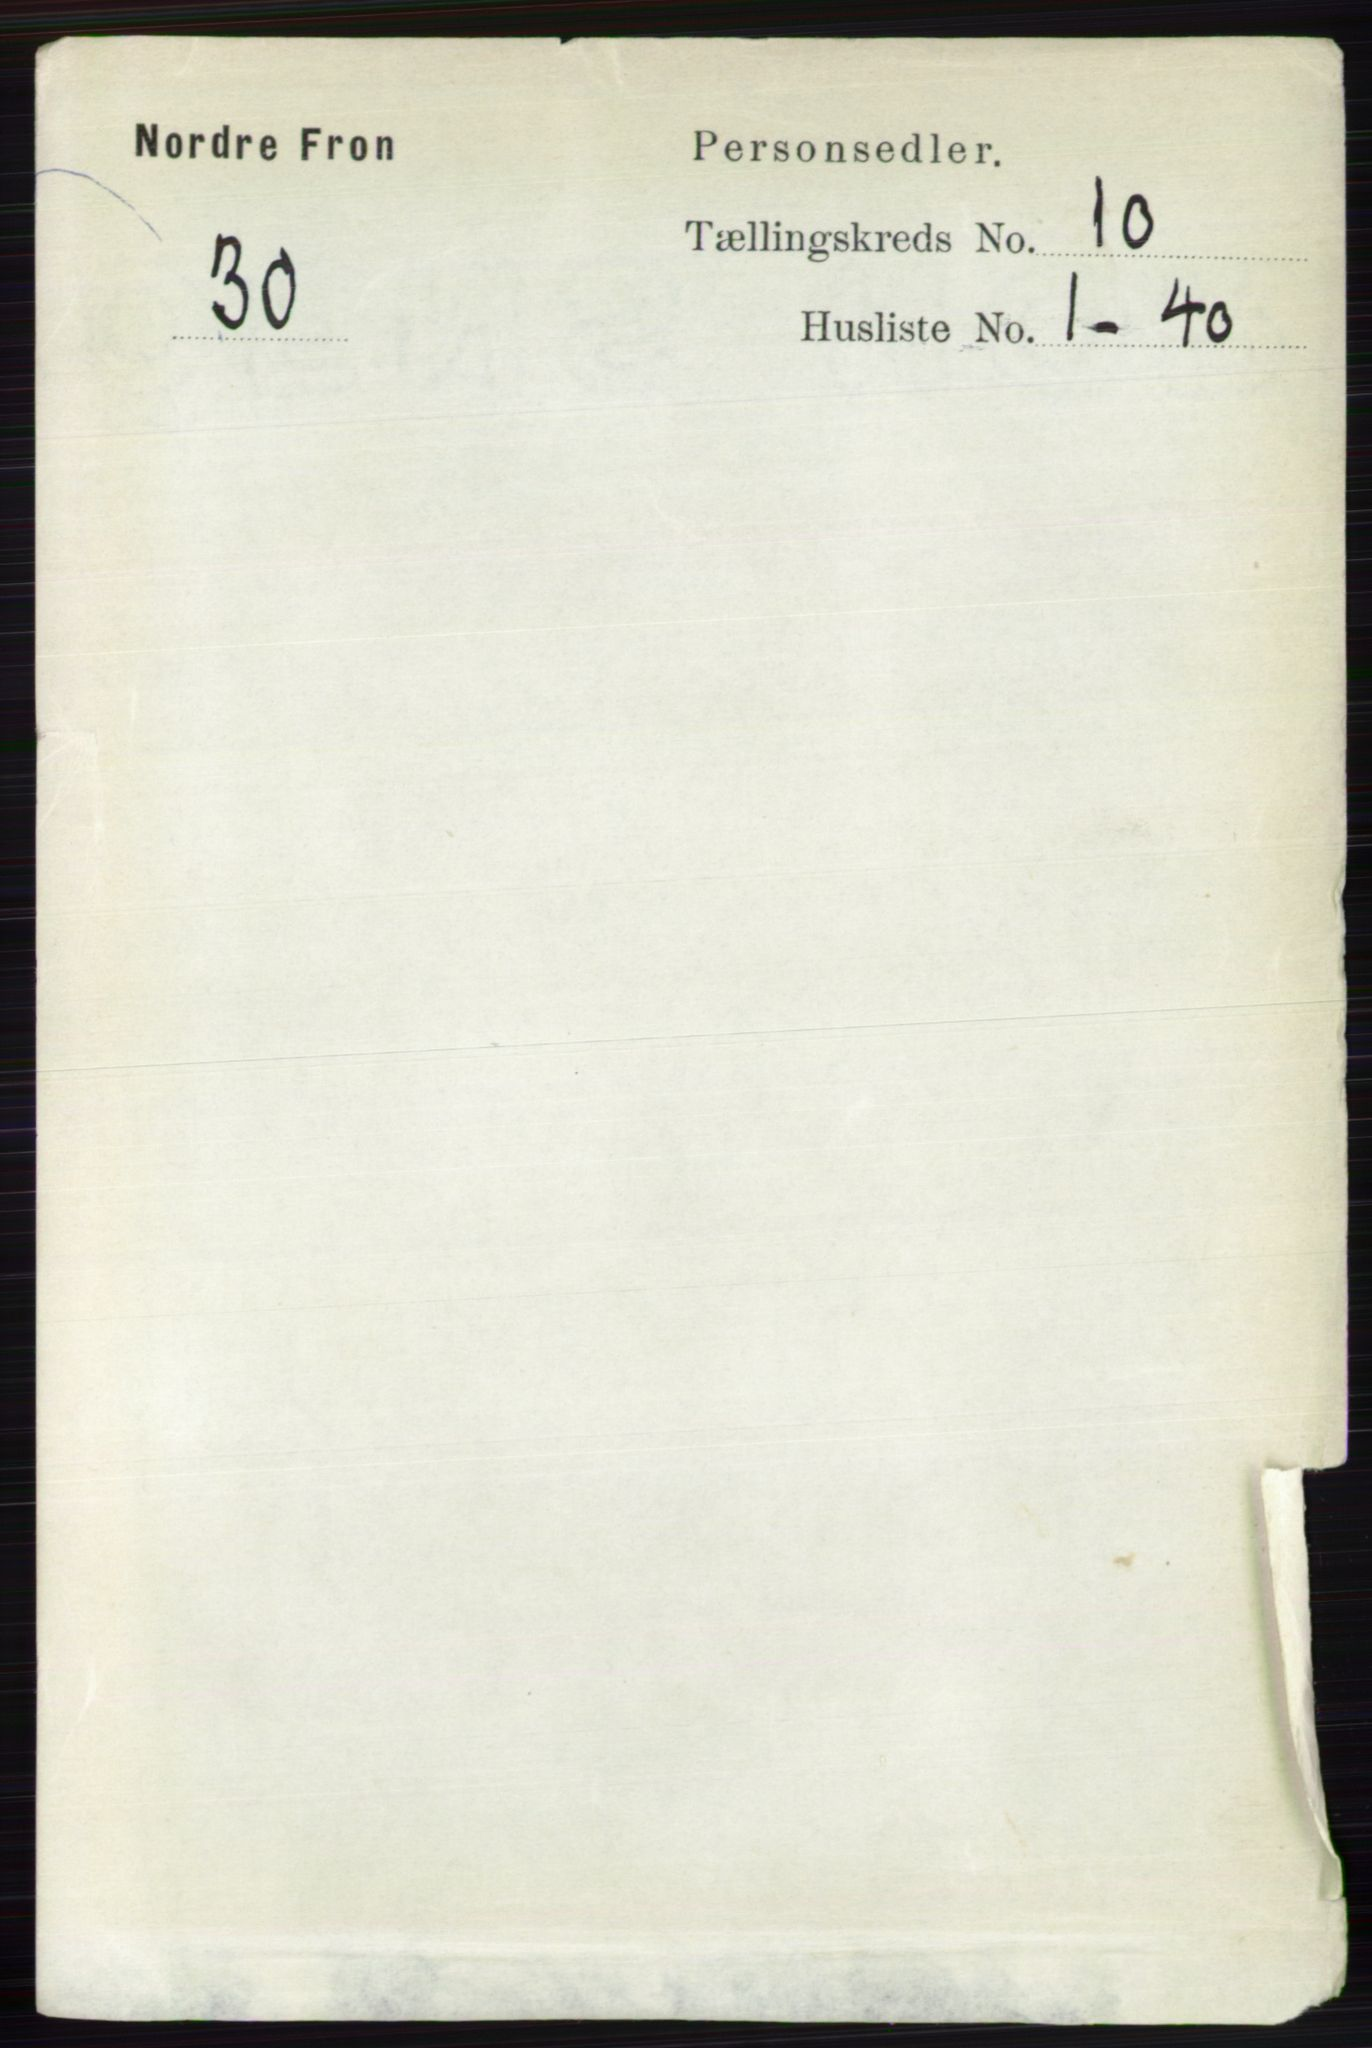 RA, Folketelling 1891 for 0518 Nord-Fron herred, 1891, s. 4386